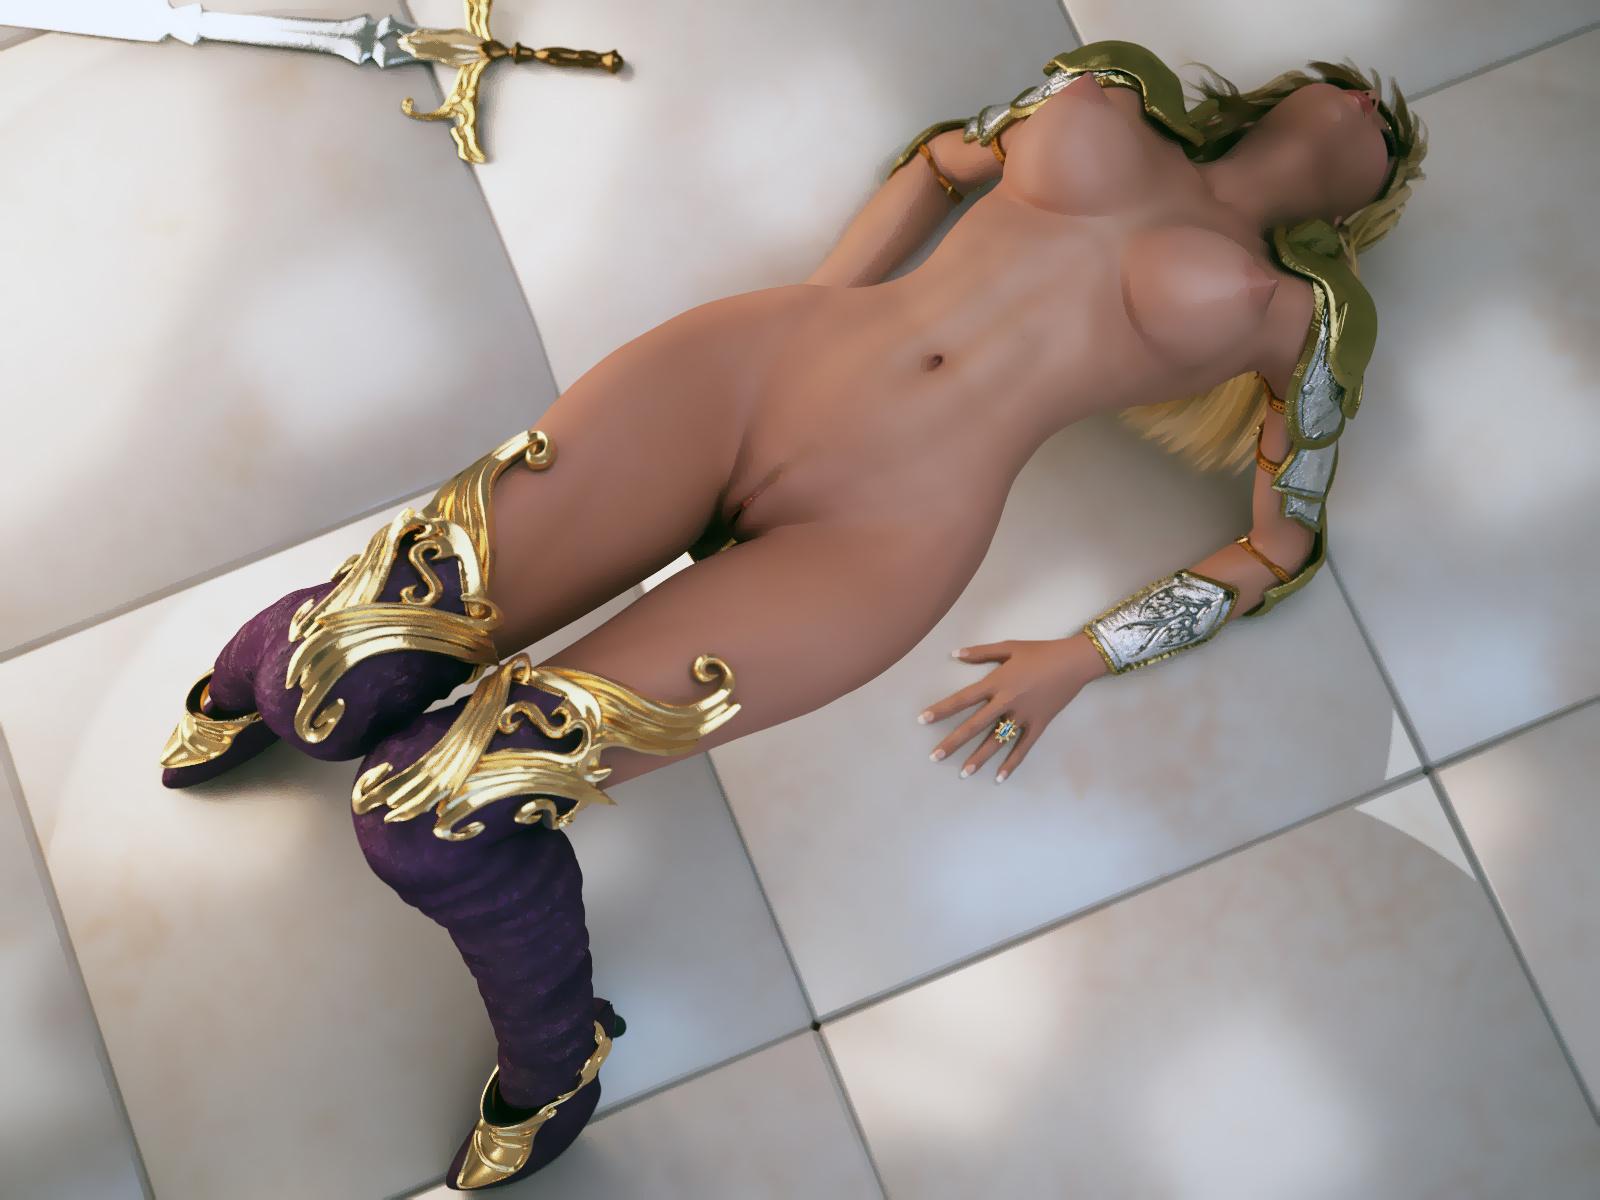 Curvy anime girl nude